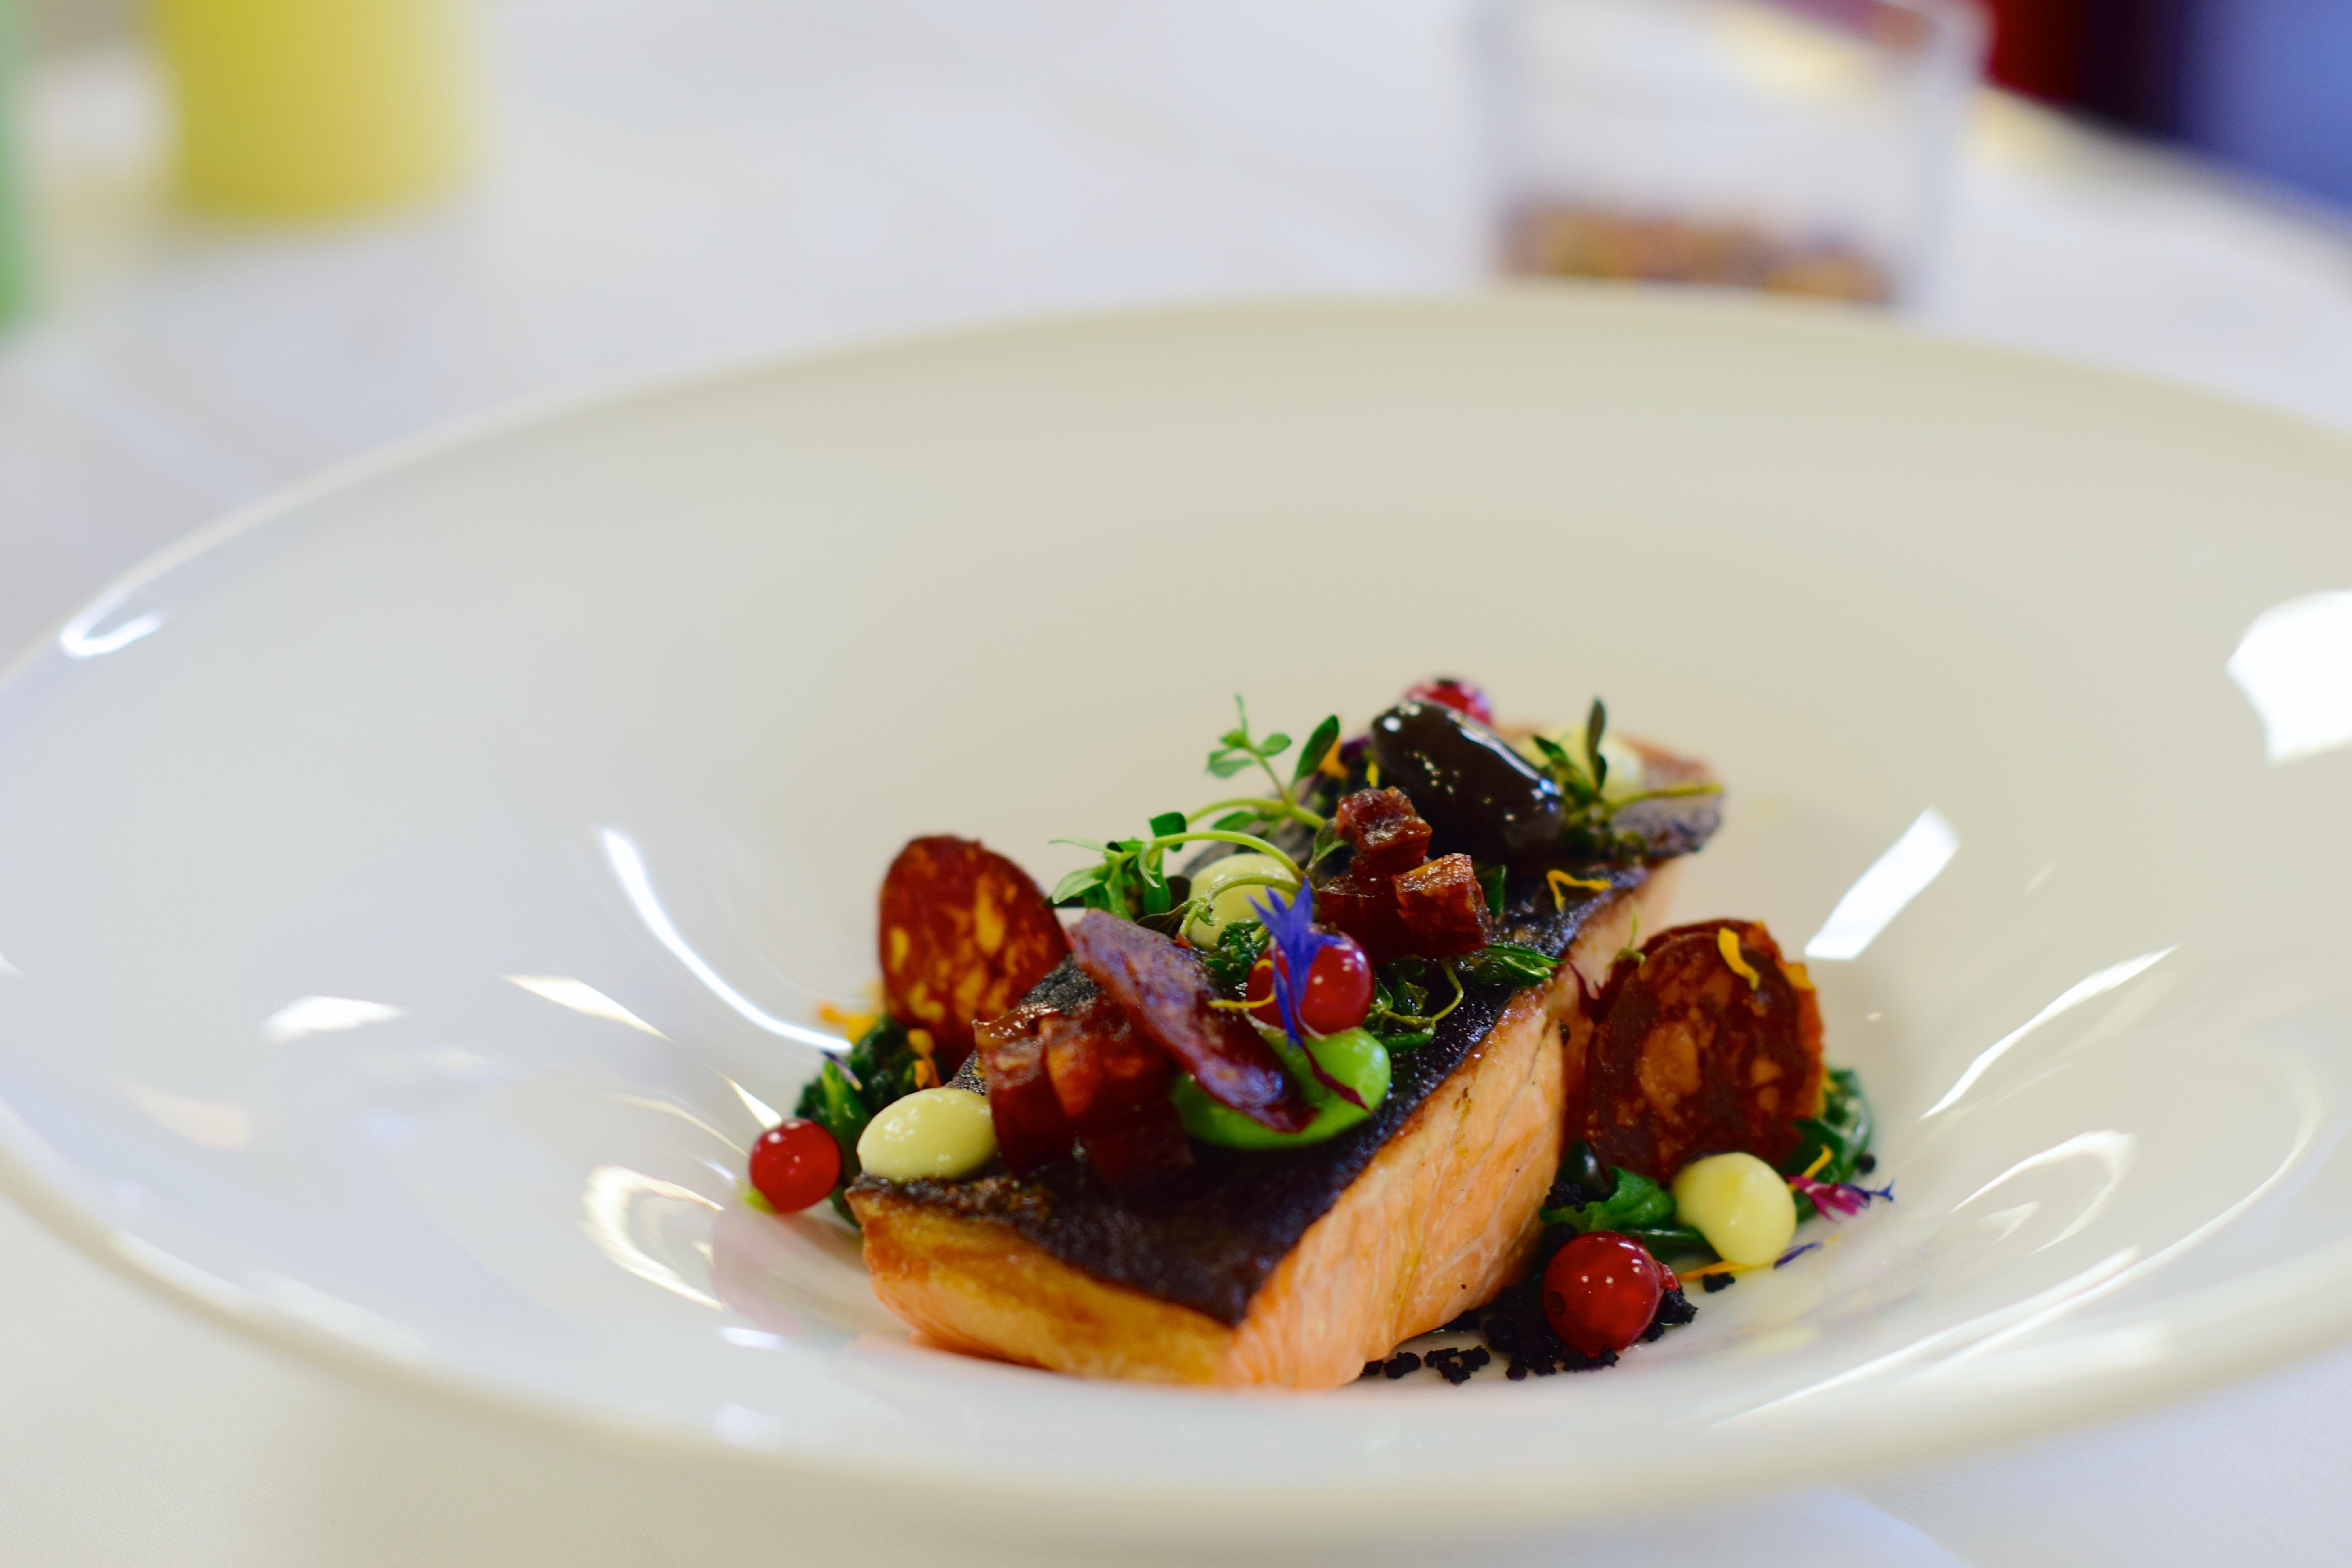 Alpen palace South Tyrol Andreas Schwienbacher cuisine gastronomy